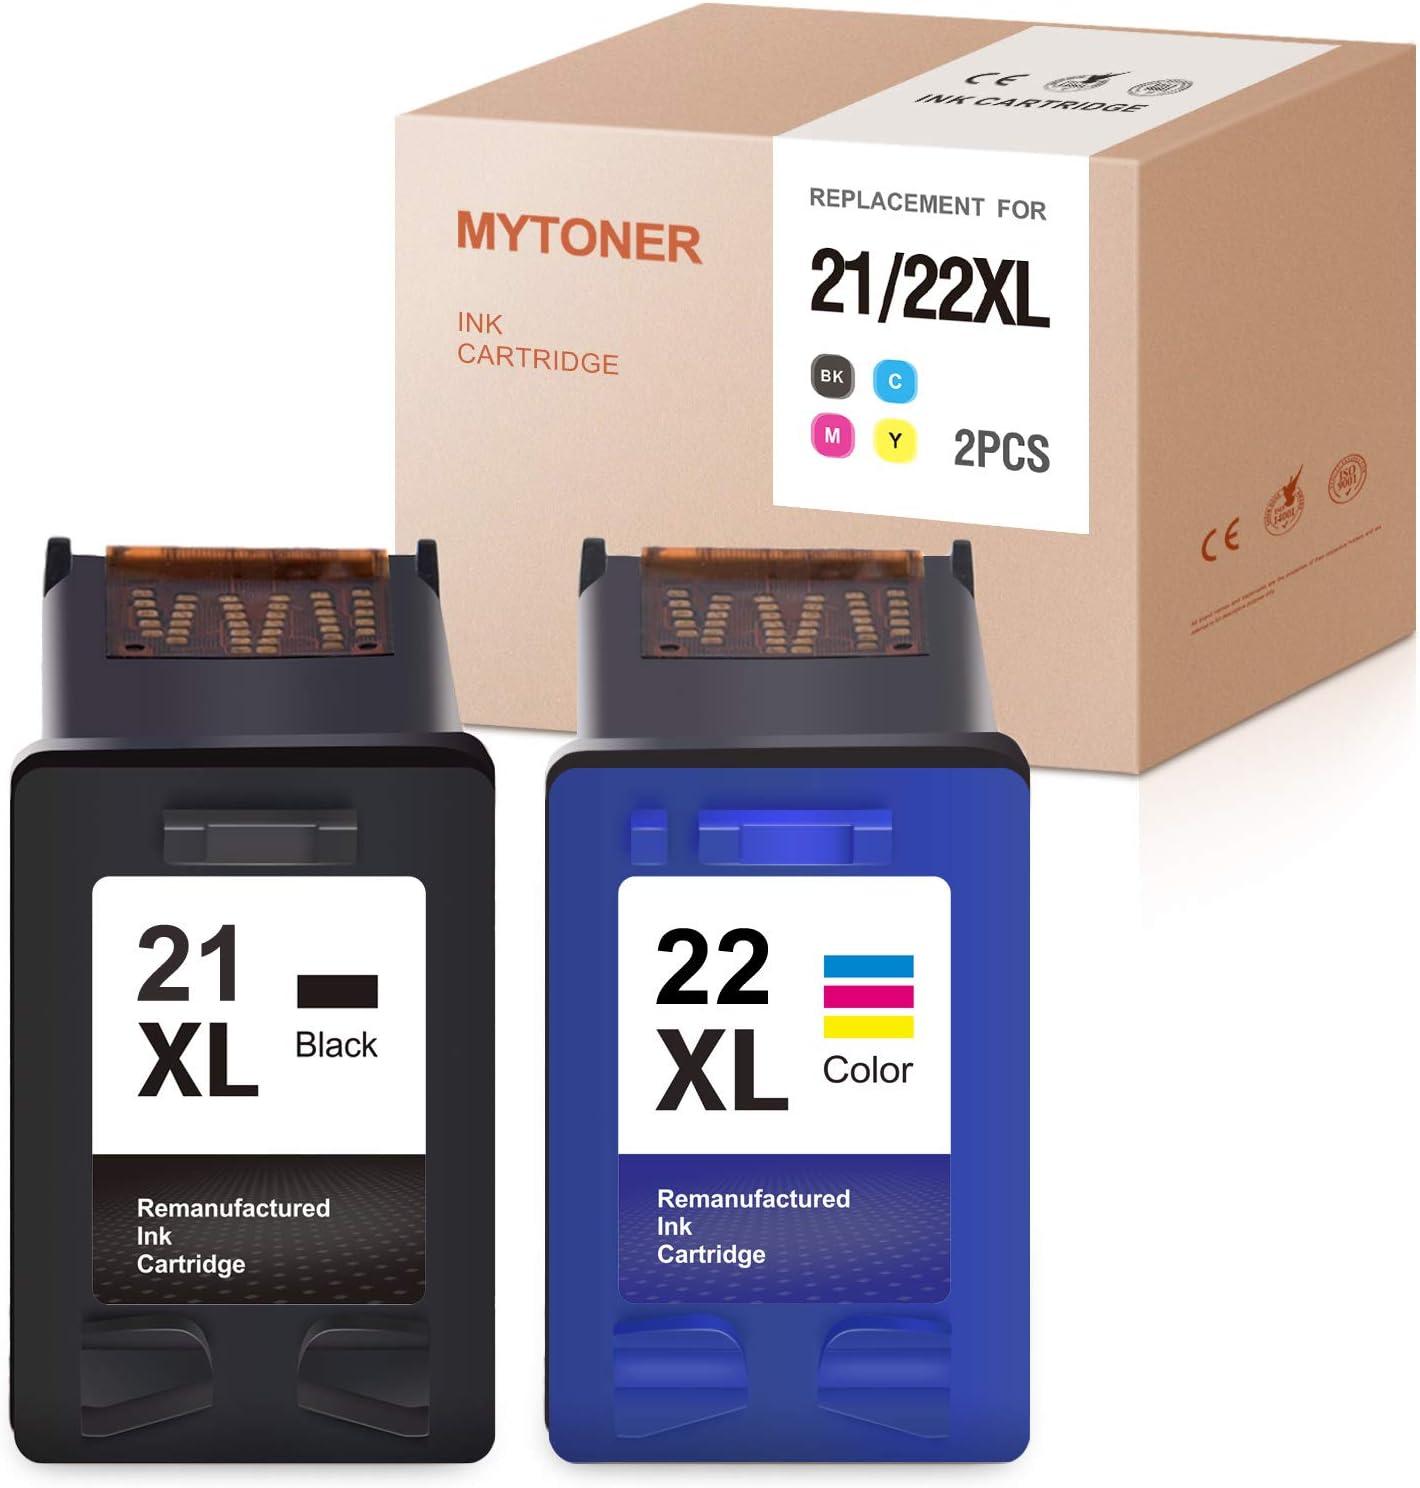 MYTONER Remanufactured Ink Cartridge Replacement for HP 21XL 22XL 21 XL 22 XL Ink for Officejet 3625 Deskjet 3915 3930 3940 D1420 D1455 D1520 D1530 D1560 D1341 D2460 PSC 1410(Black Tri-Color, 2-Pack)